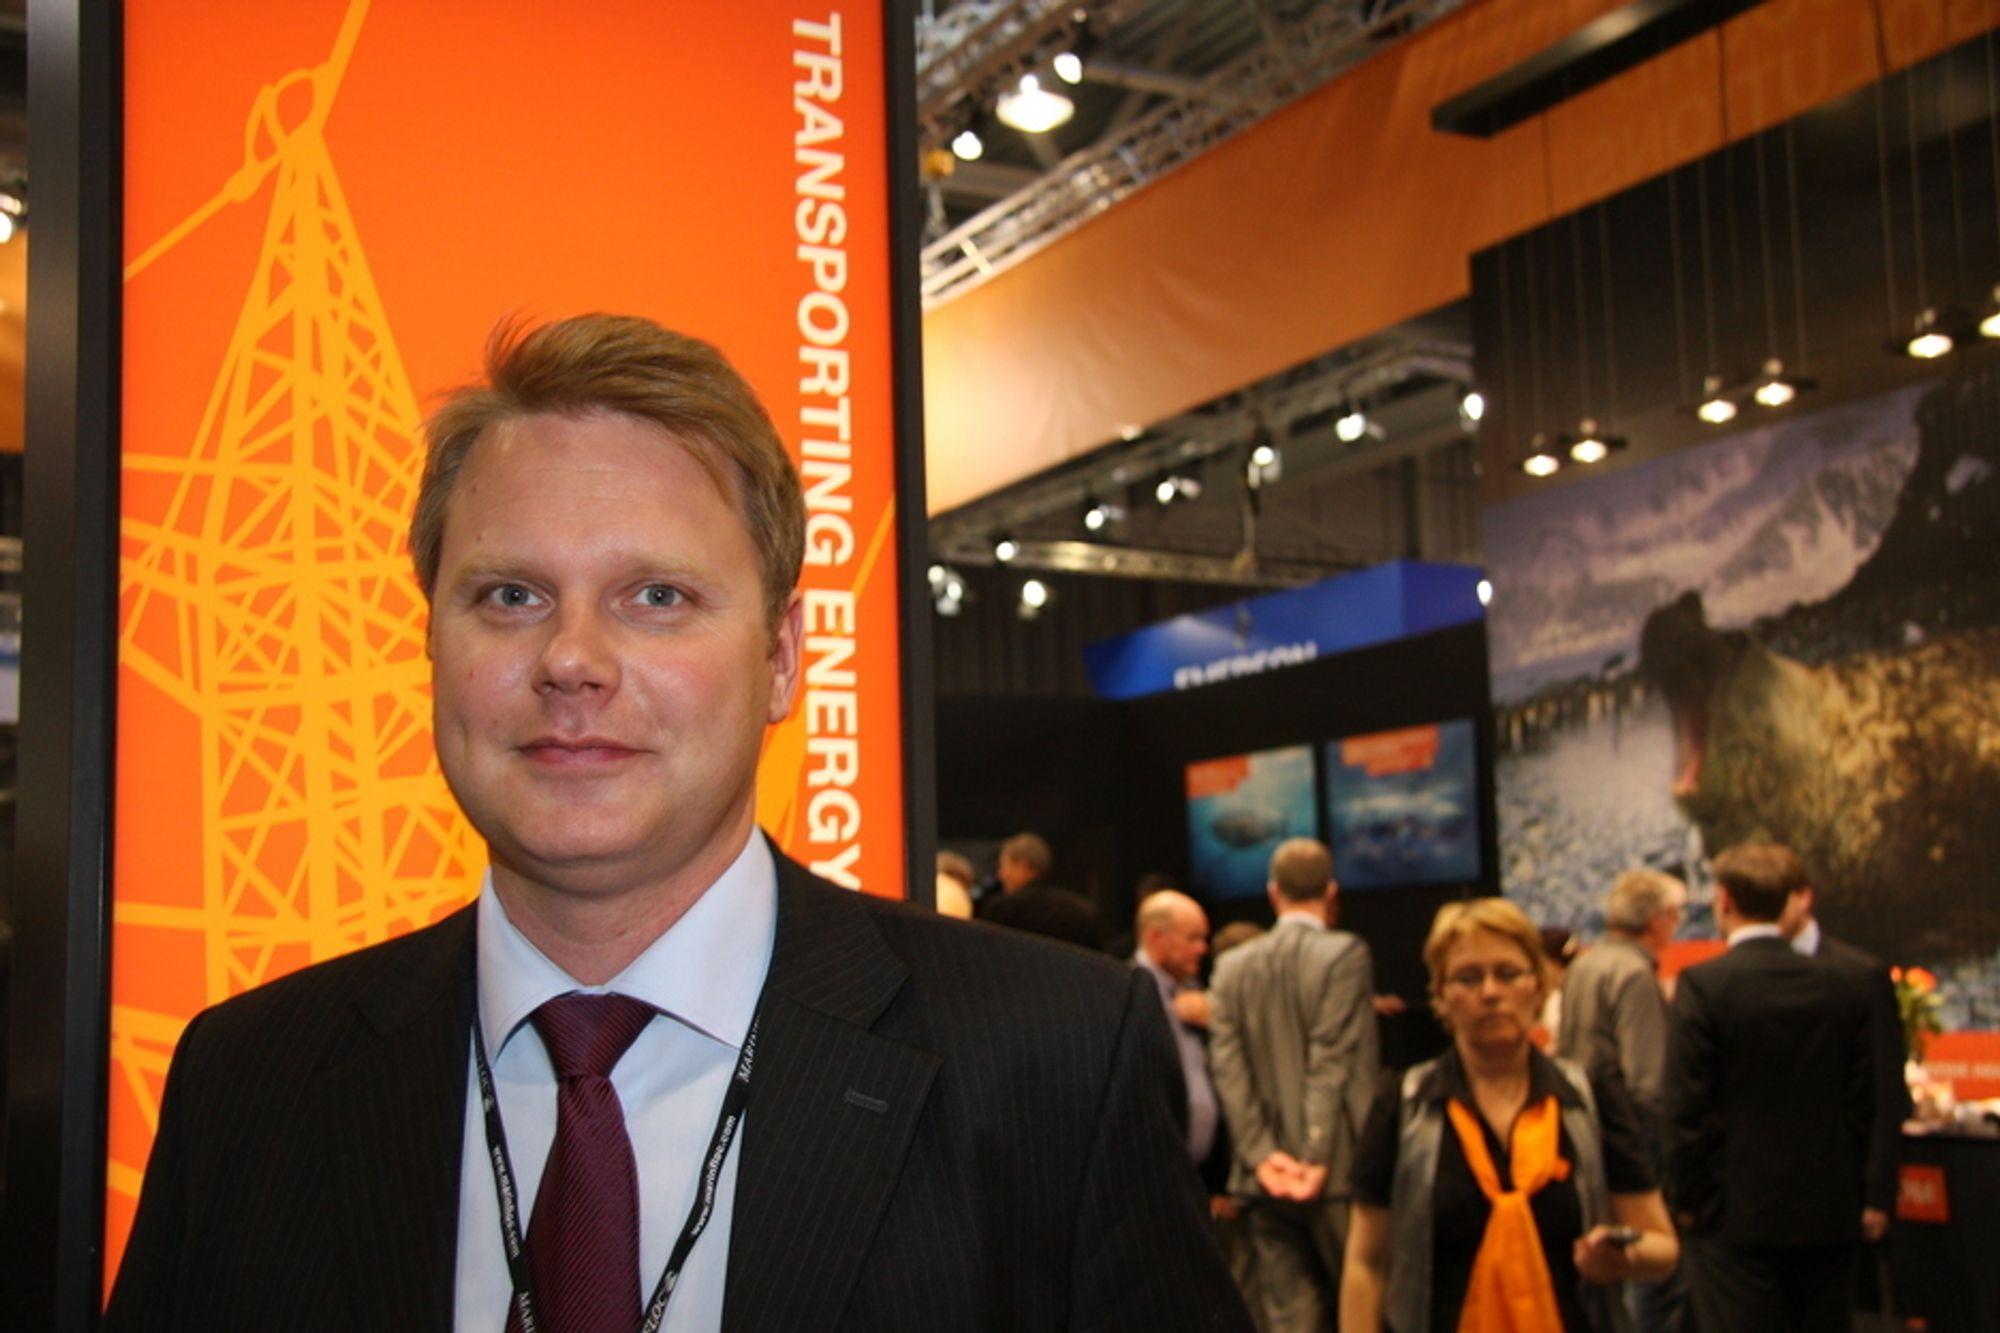 DESIGNSJEF: Finnen Riku-Pekka Hägg bygger opp Wärtsiläs designselskap. Kjøpet av Vik-Sandvik ga selskapet et solid løft.